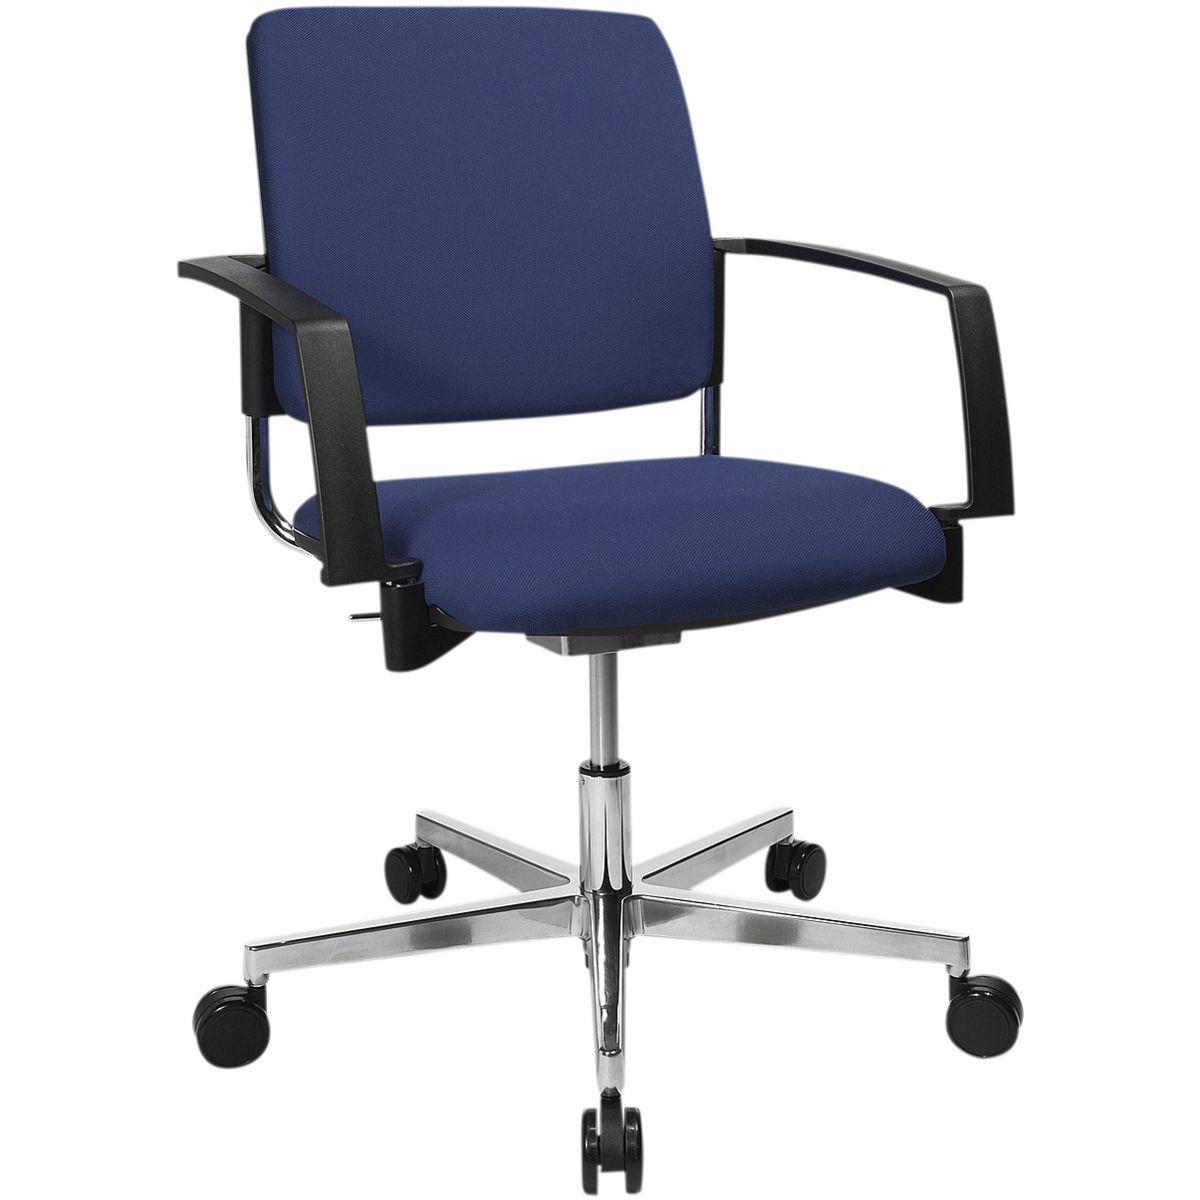 Topstar Besucherstuhl höhenverstellbar »BtoB 40«   Büro > Bürostühle und Sessel  > Besucherstühle   Aluminium   TOPSTAR